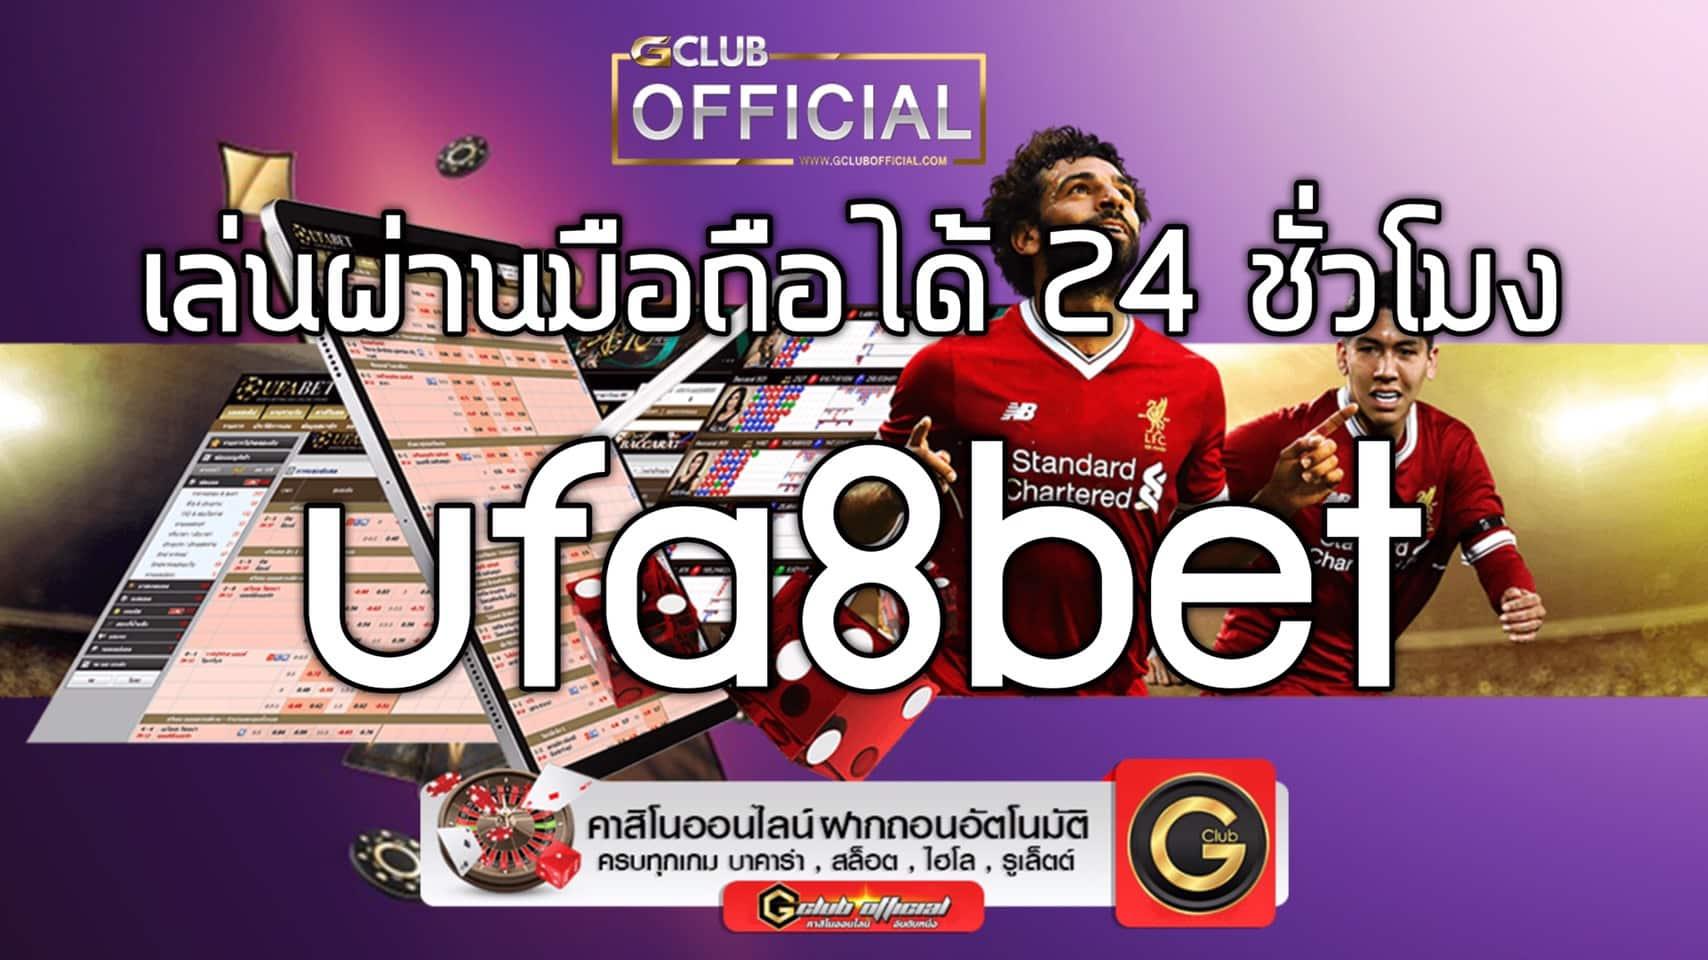 ufa8betเล่นผ่านมือถือได้ตลอด 24 ชม.